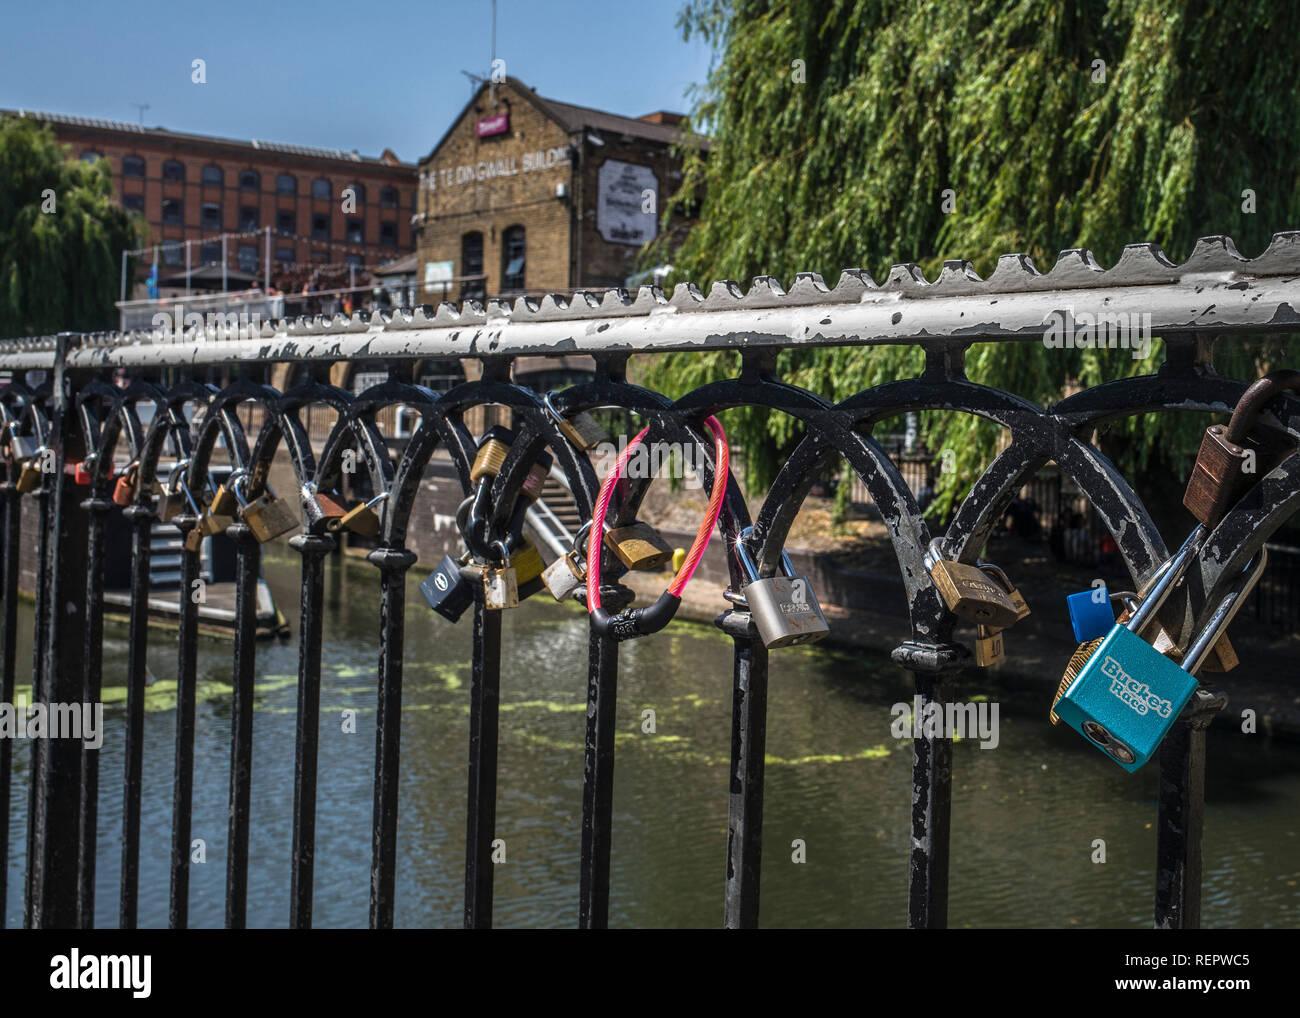 love locks at camden lock. padlocks on fence. - Stock Image